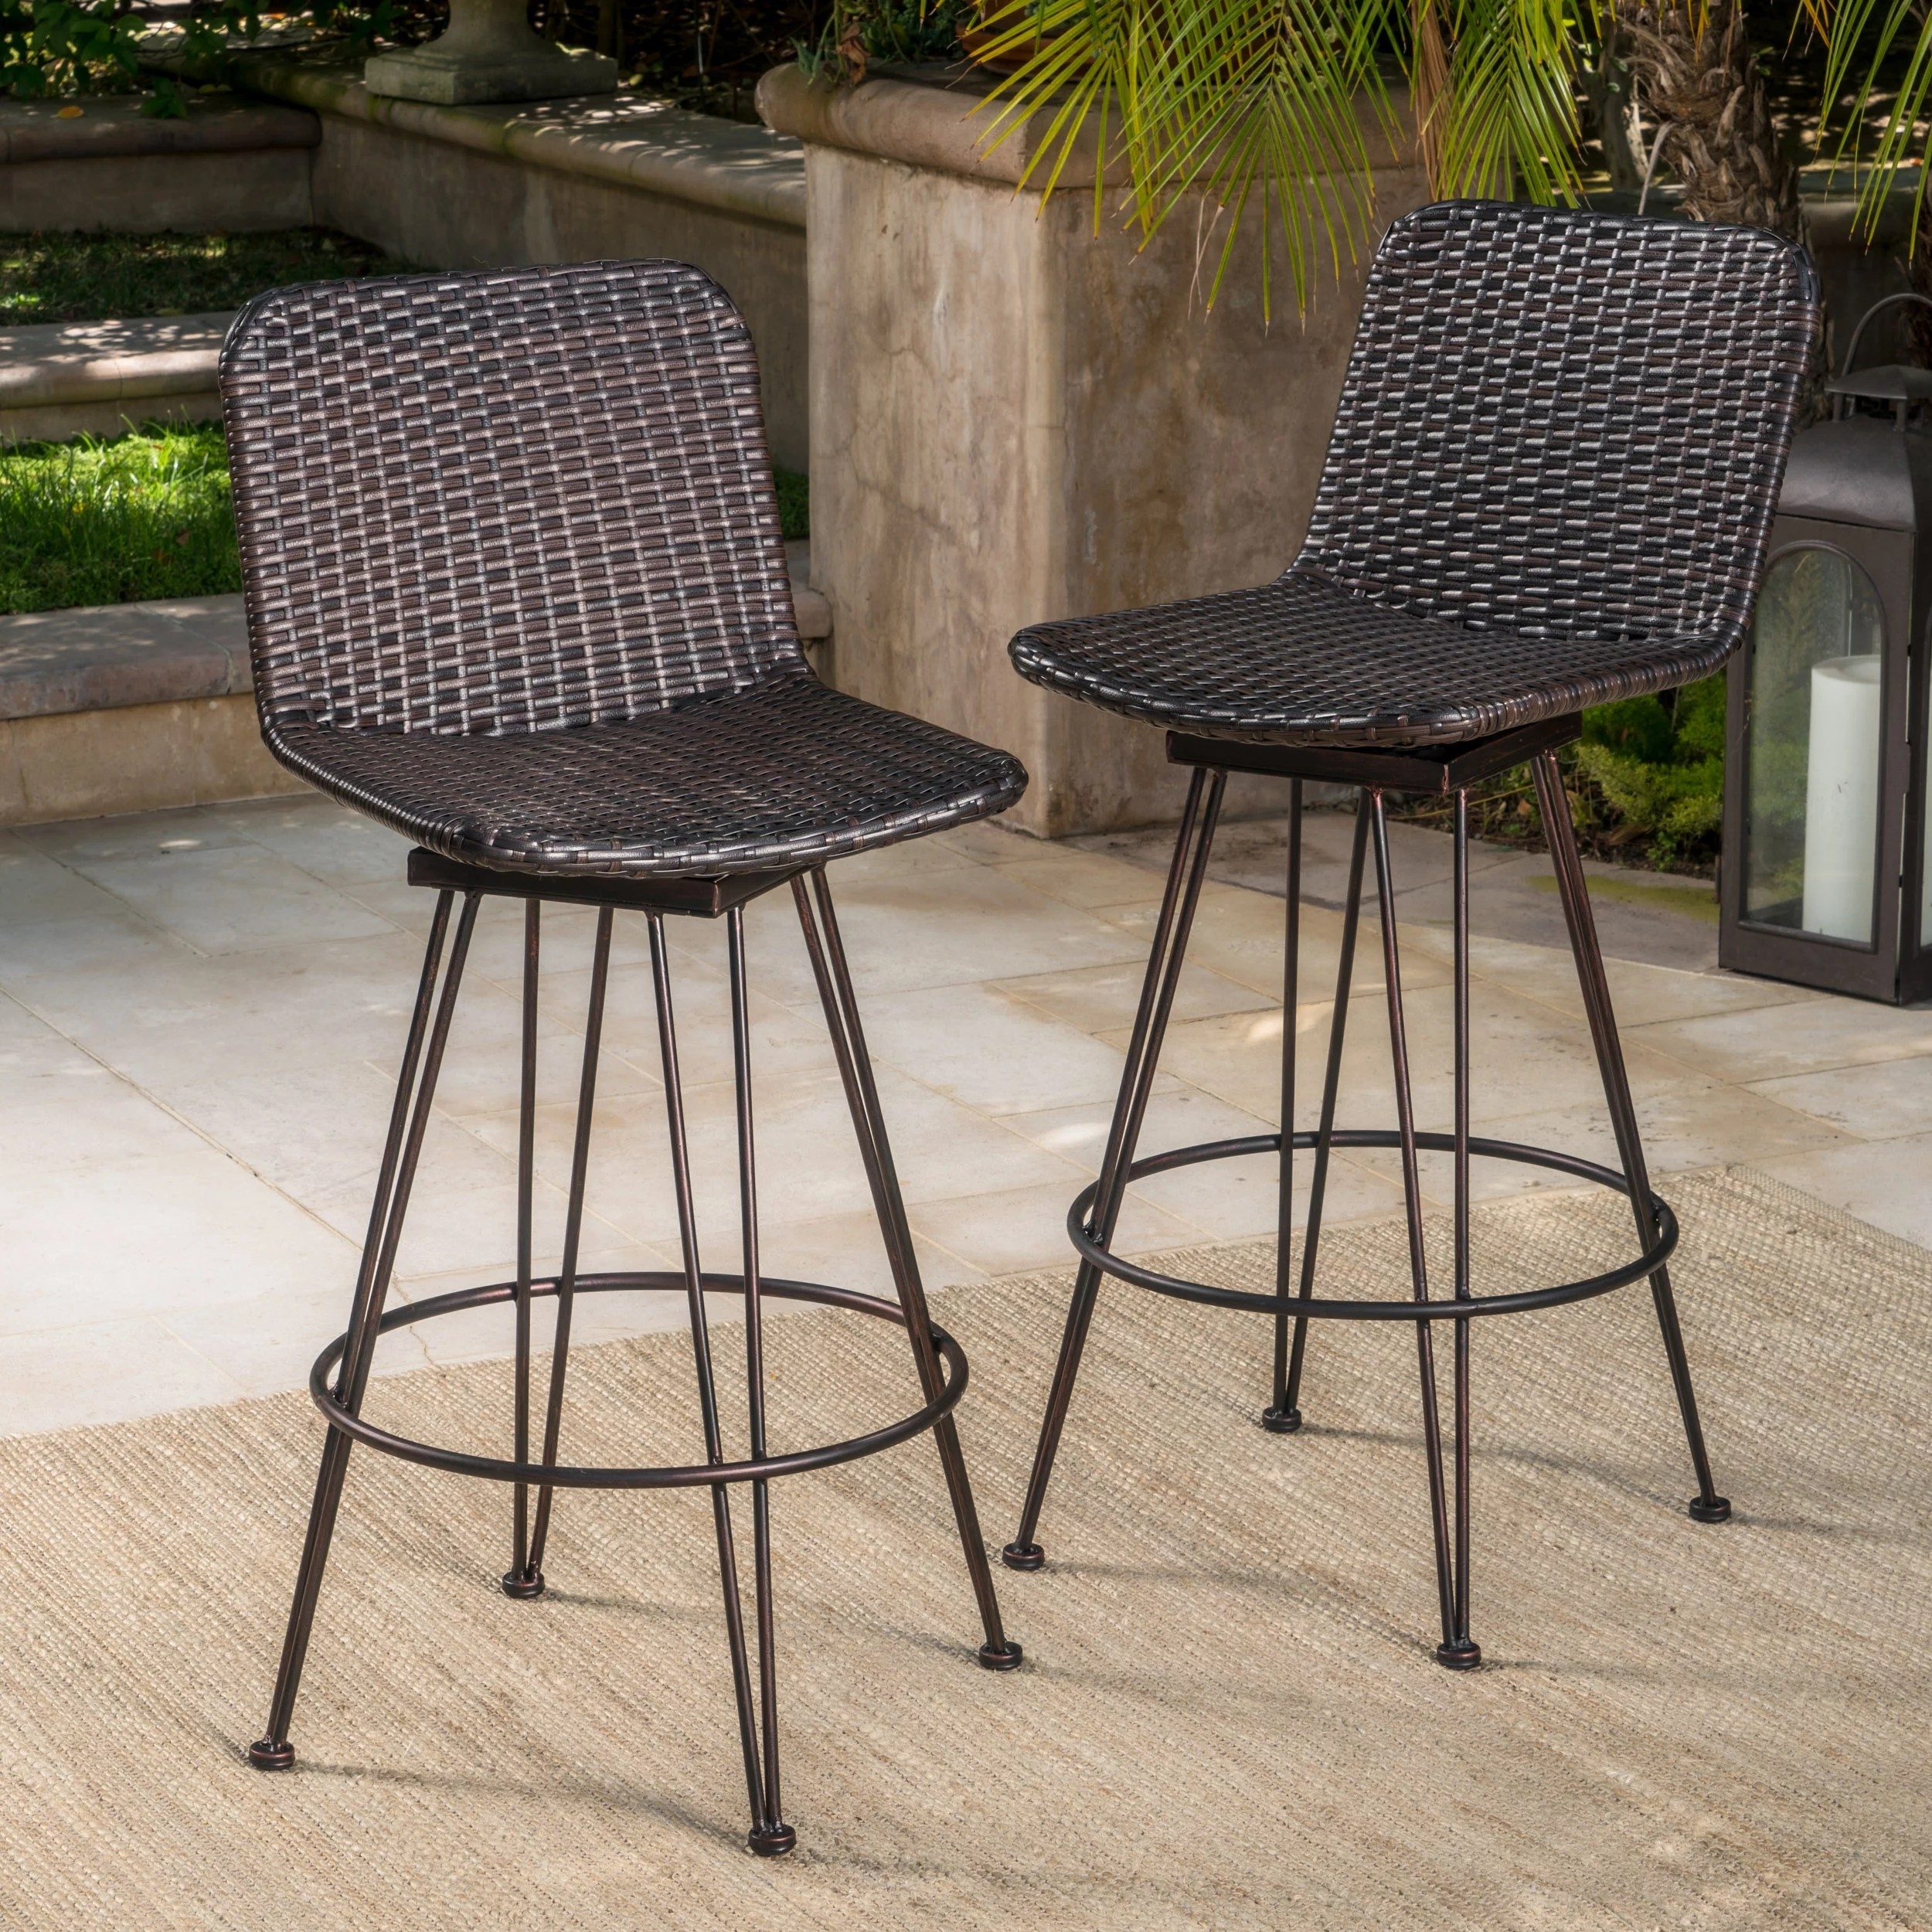 Topanga Outdoor Wicker Barstools With Black Brush Copper Iron Frame Set Of 2 Multibrown Walmart Com Walmart Com